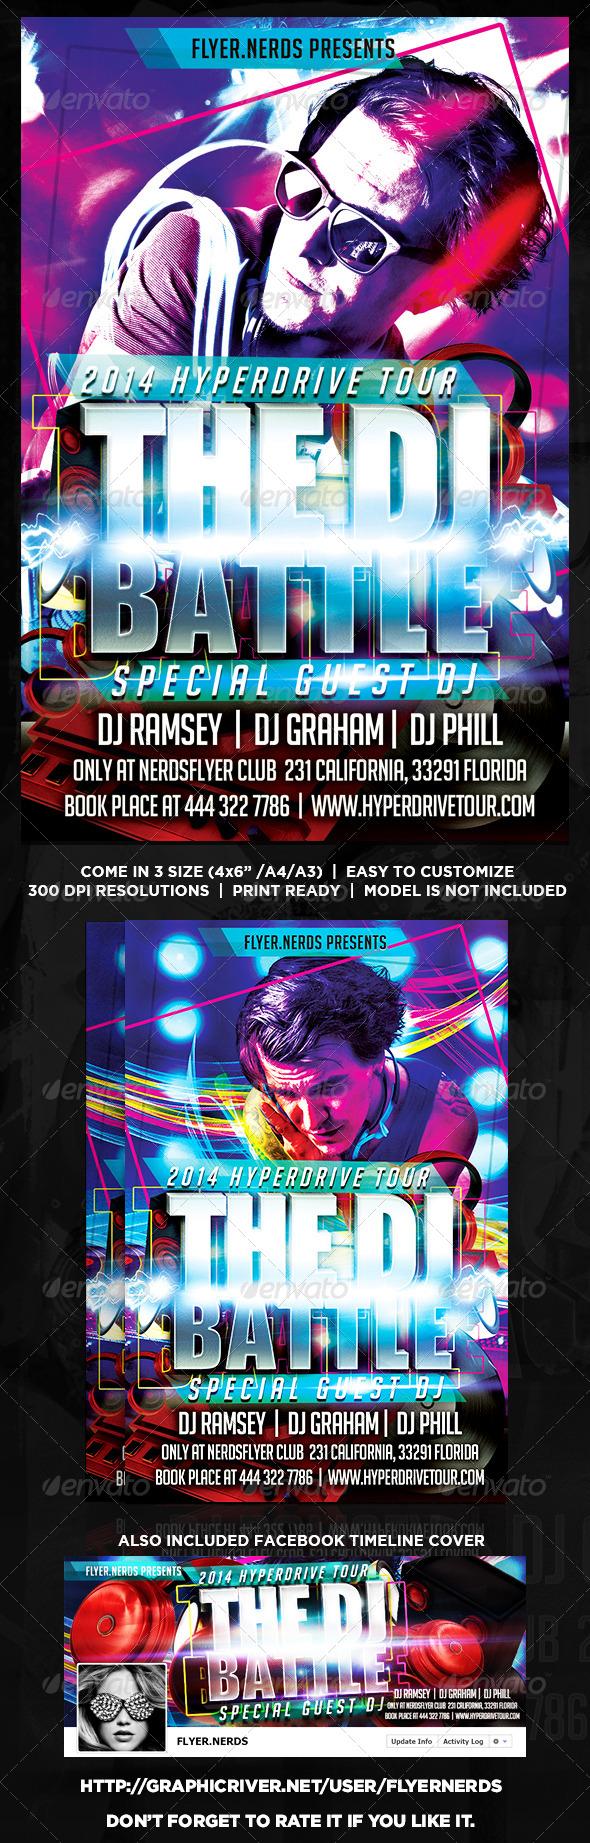 GraphicRiver The DJ Battle Flyer 8756147